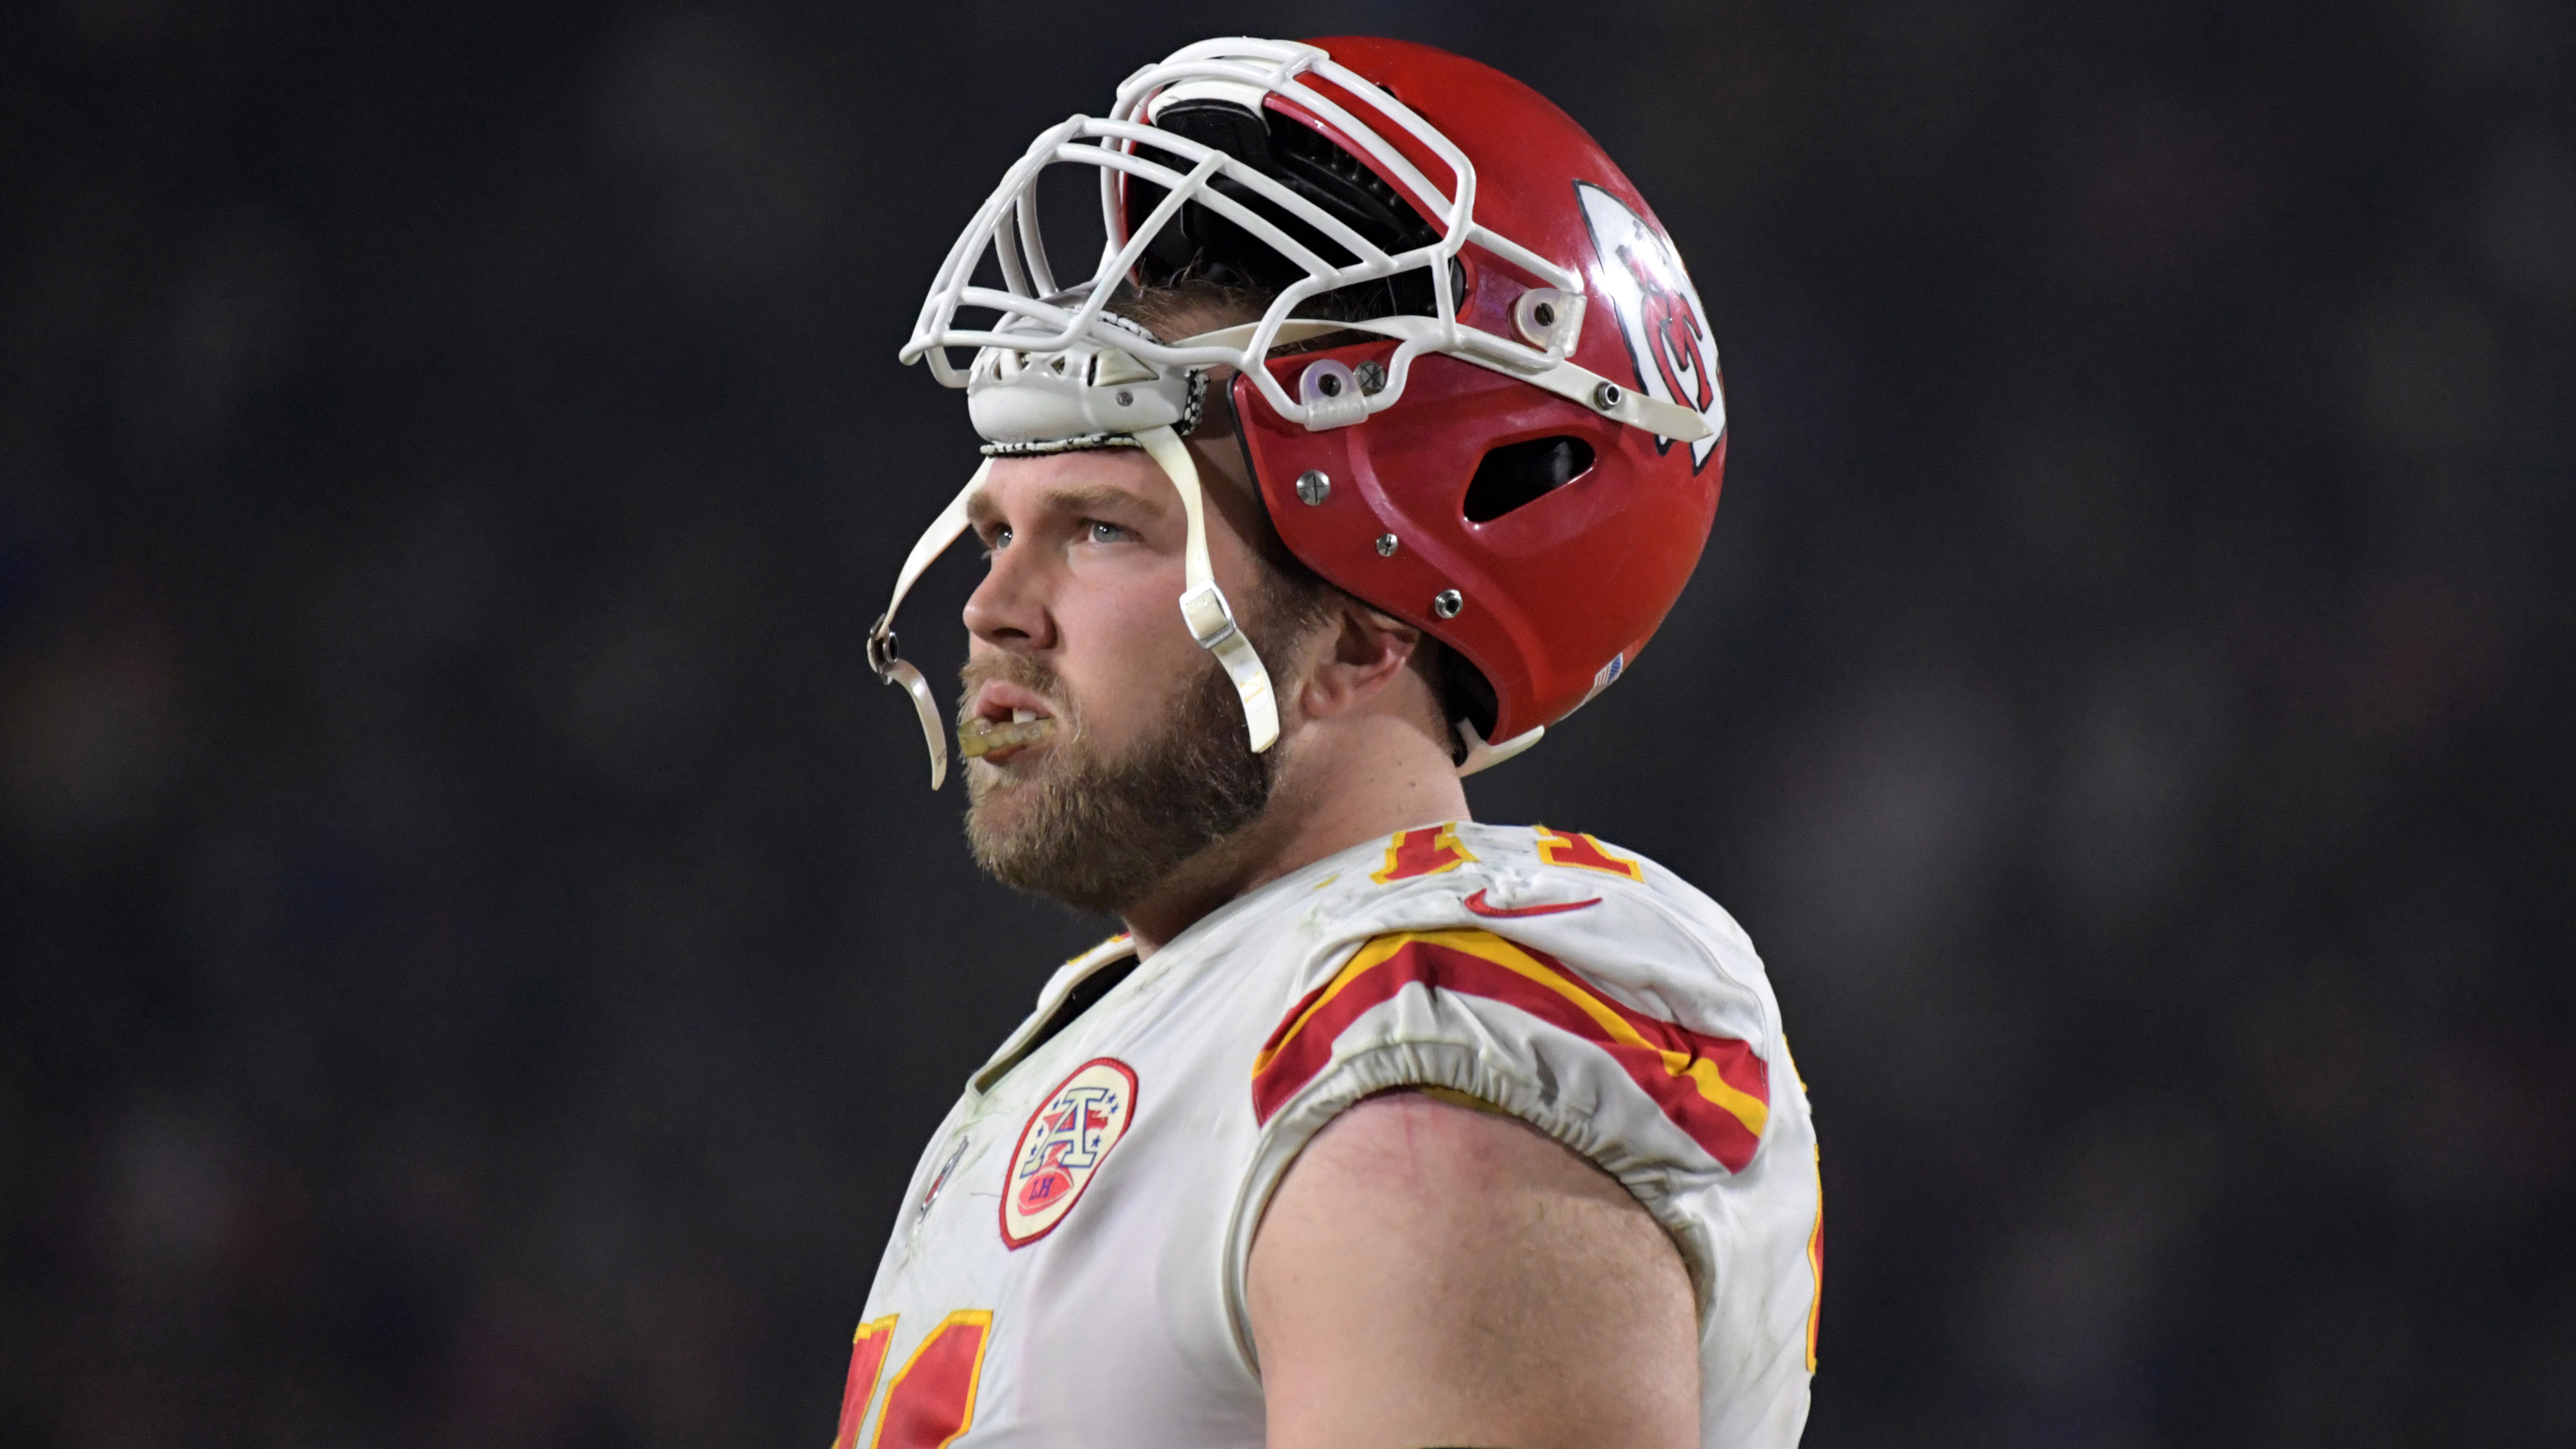 Chiefs RT Schwartz's snap streak ends with knee injury